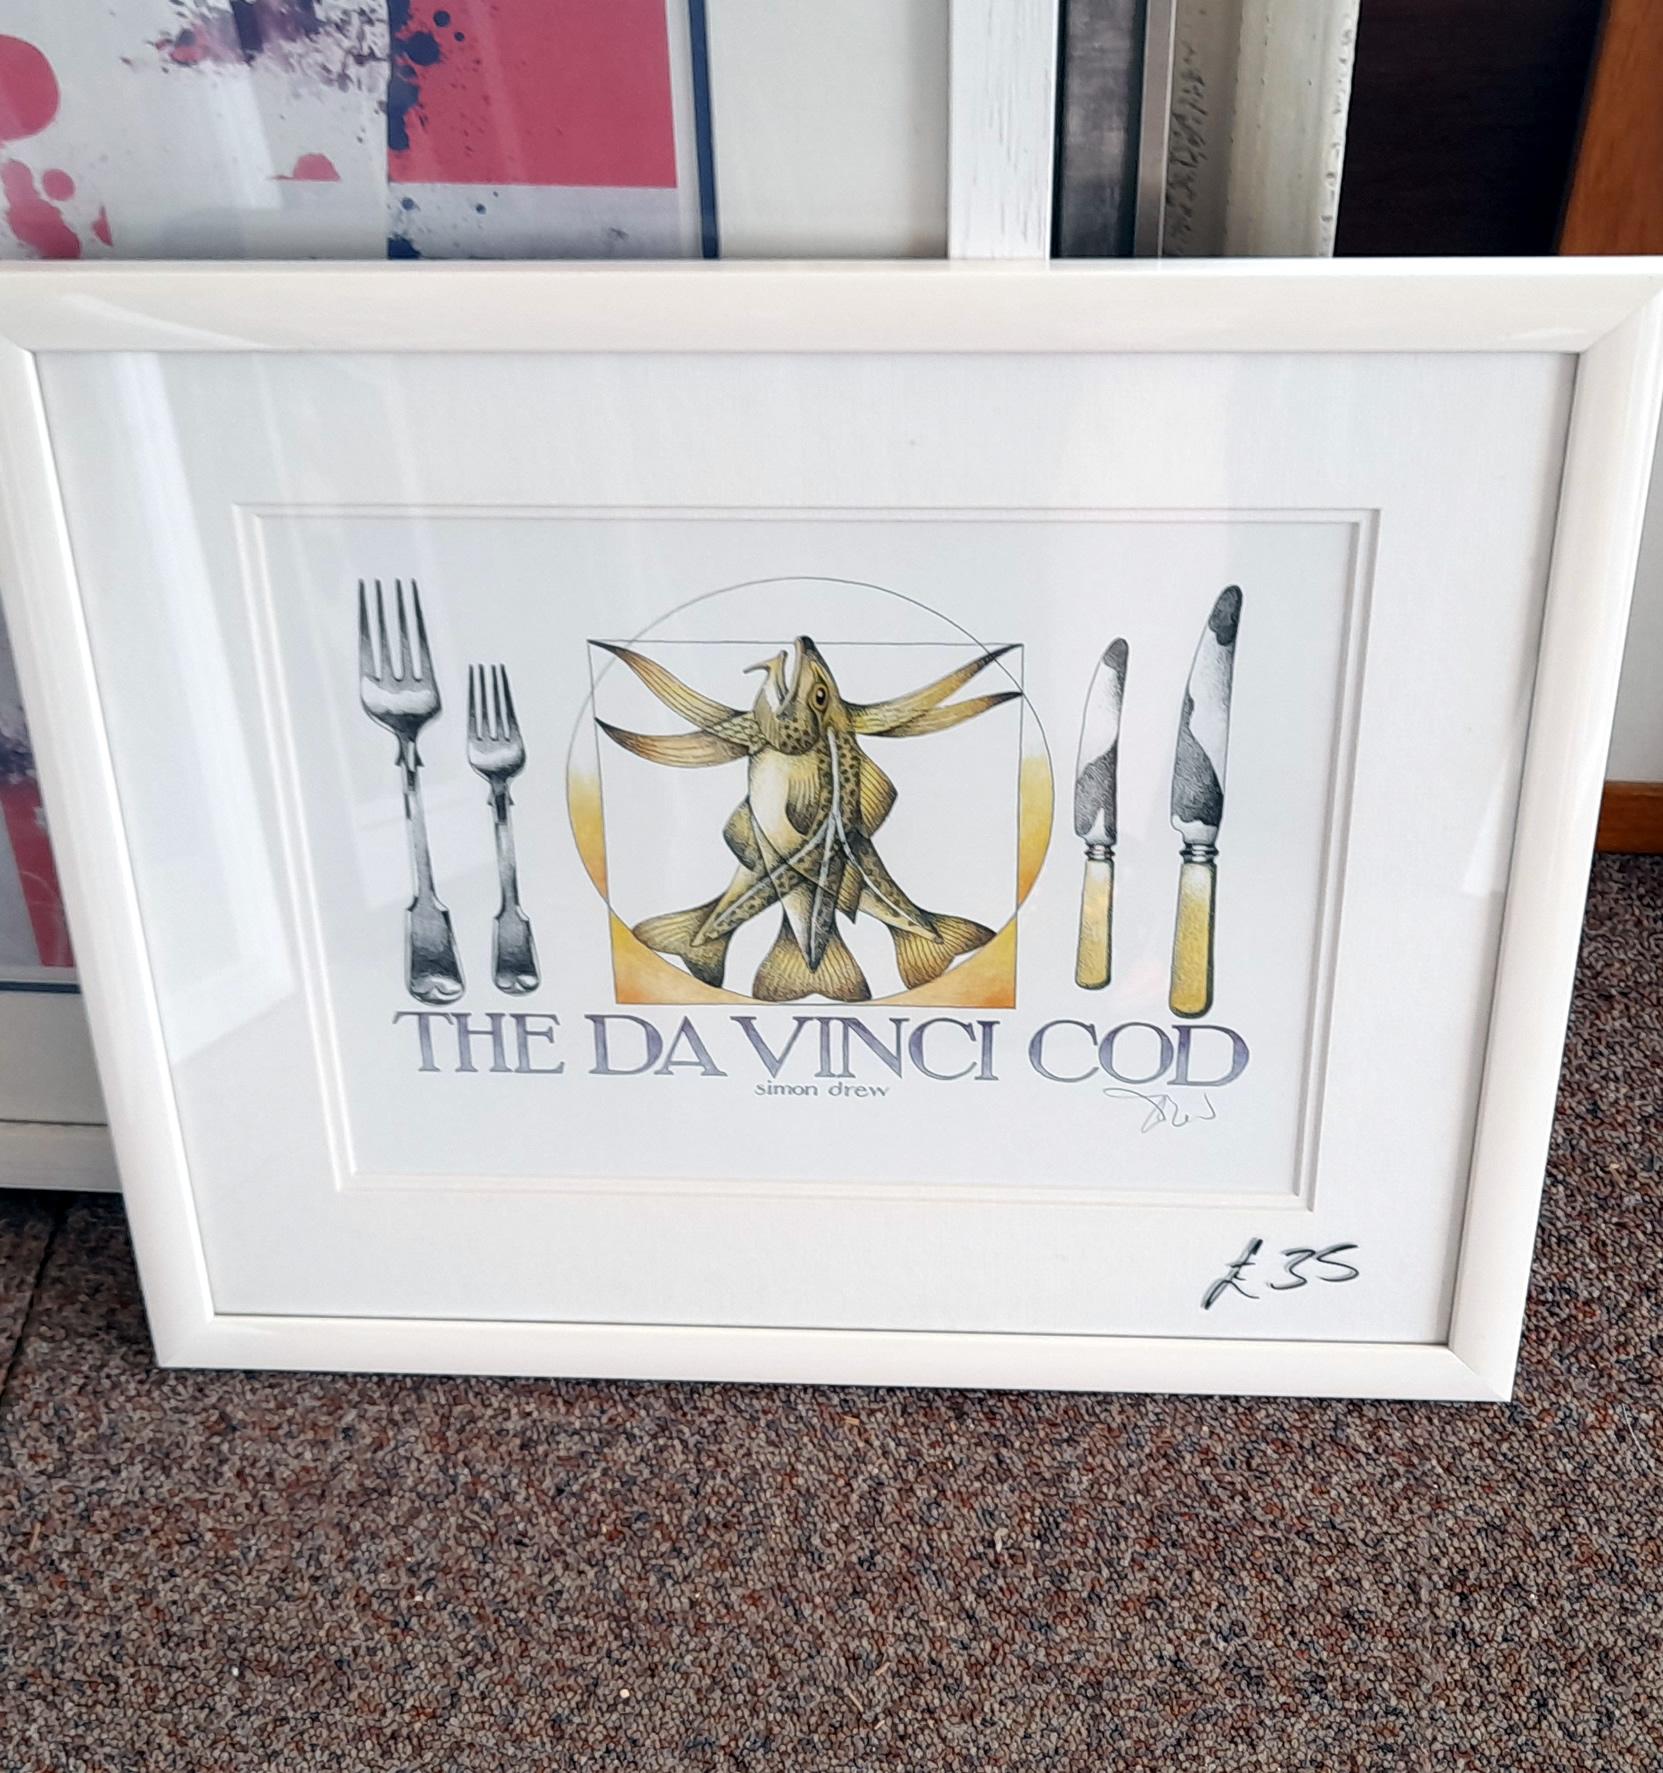 The Da Vinci Cod